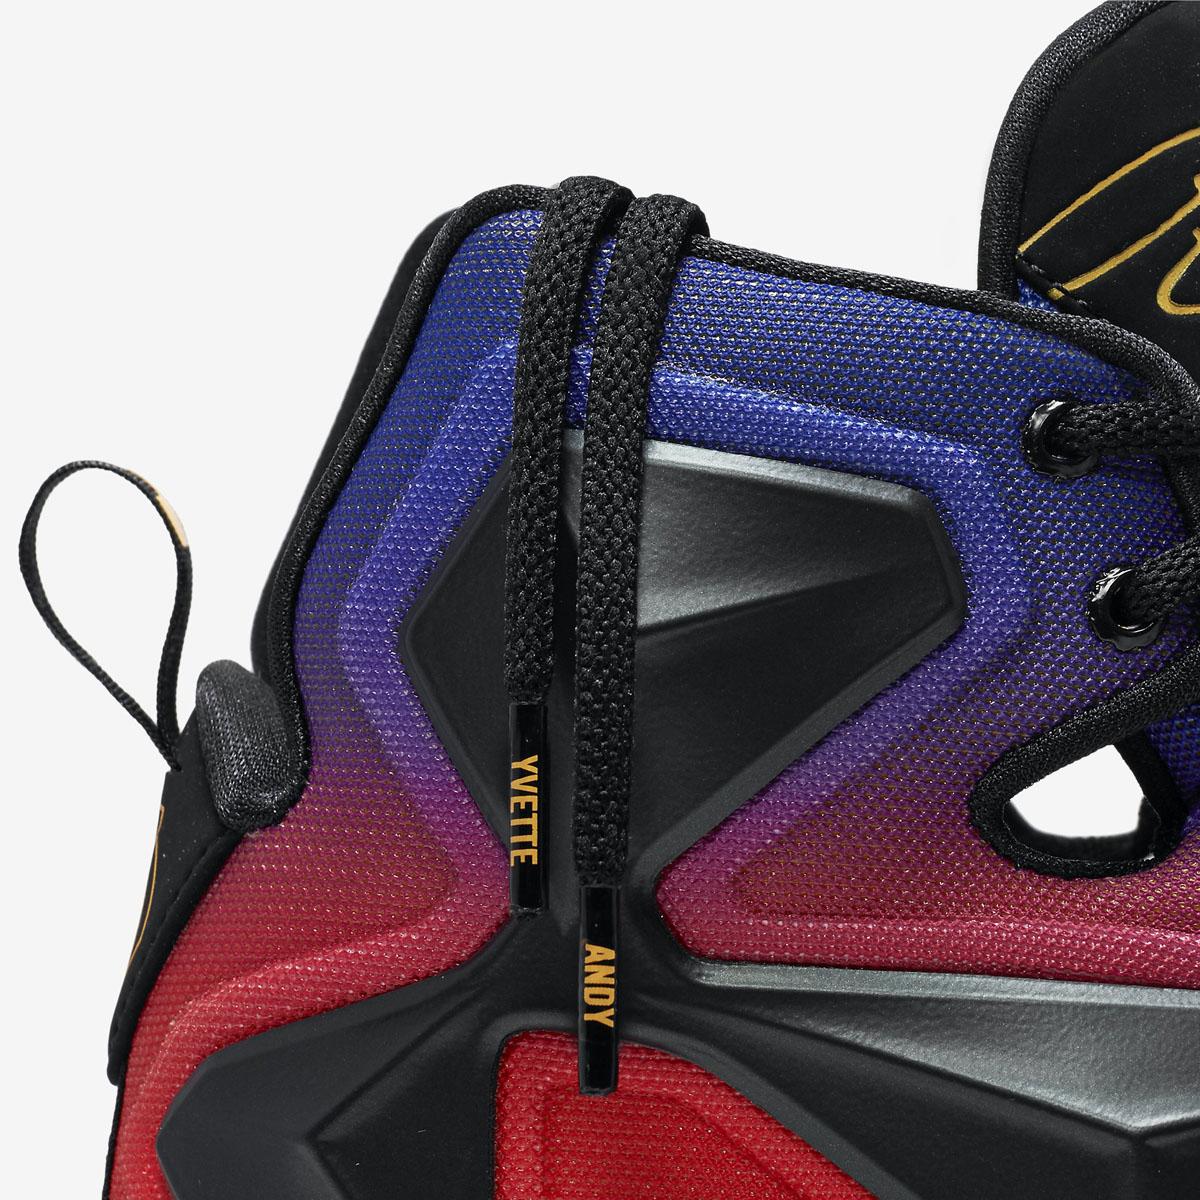 free shipping 4a9e1 e1df4 Nike LeBron 13 Doernbecher 838989-805 (9)